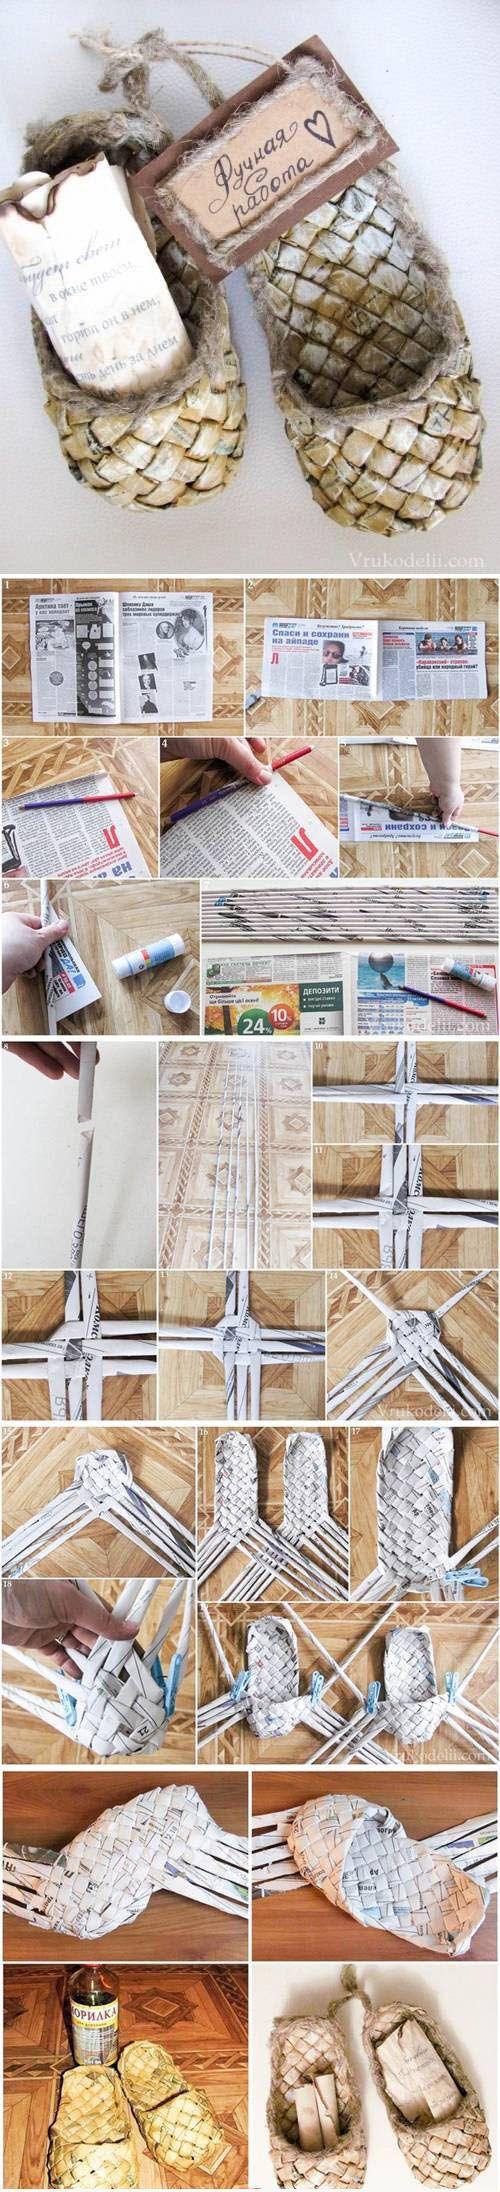 лапти из бумаги